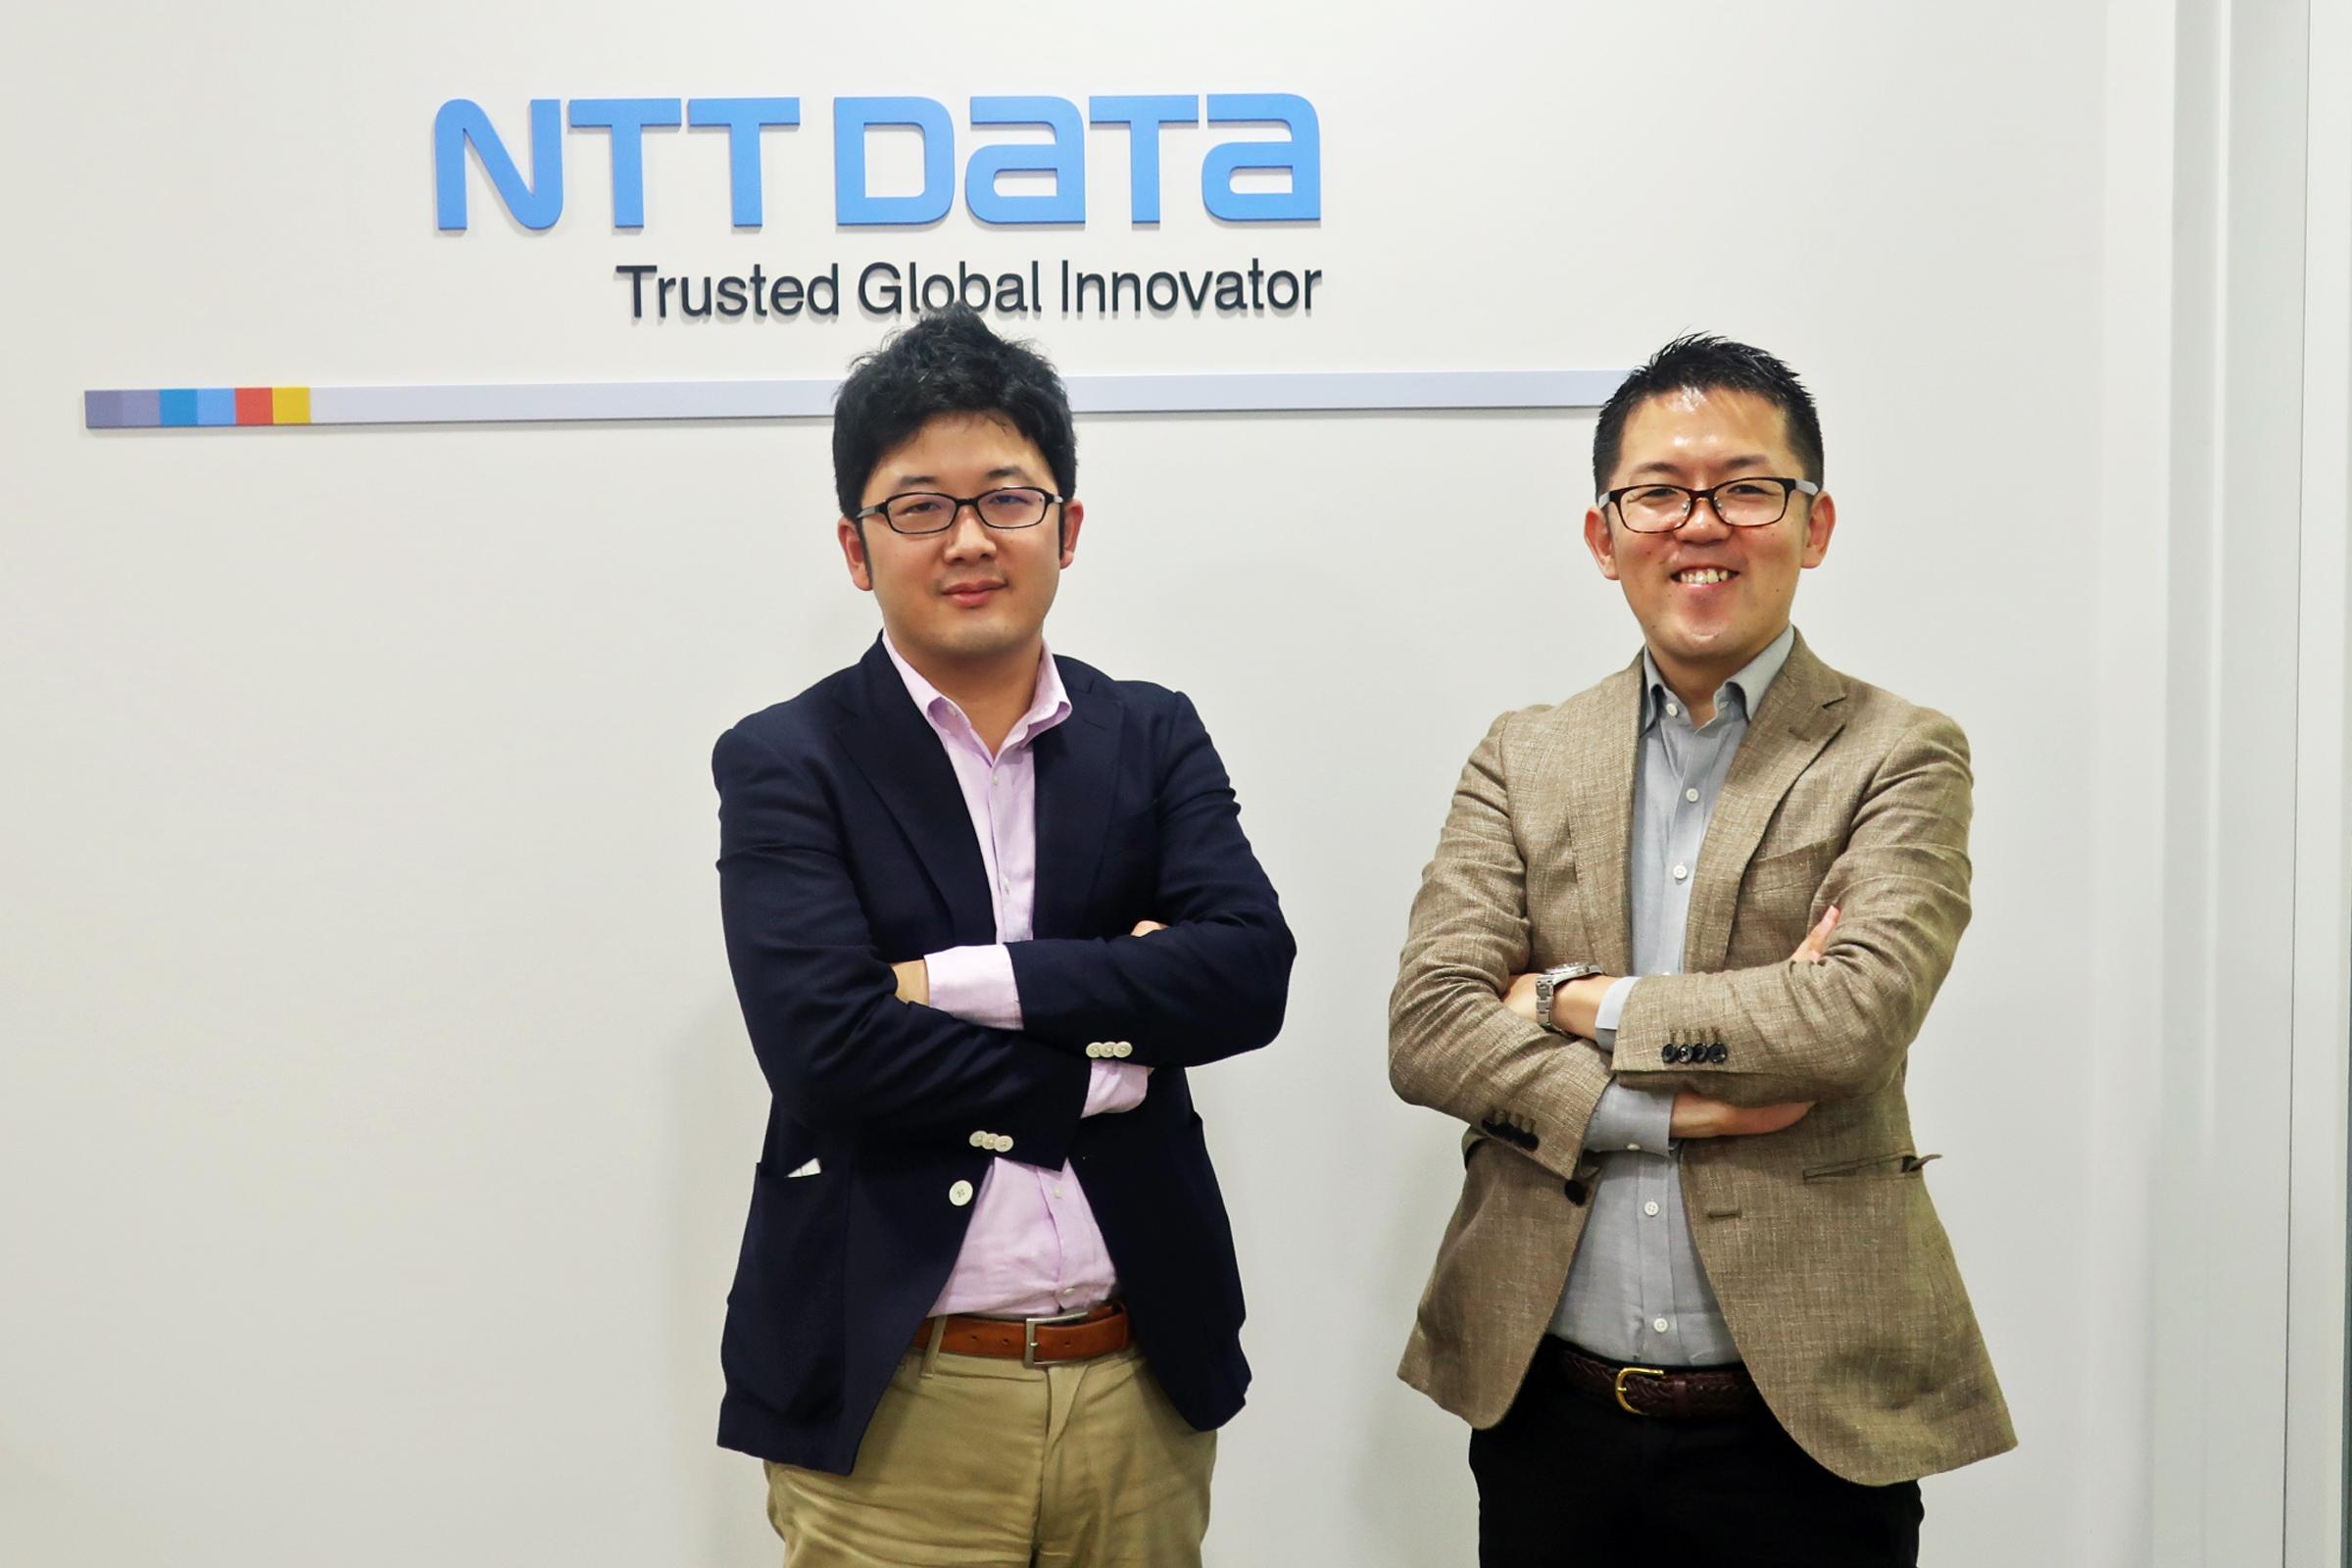 NTTデータ デジタルコンサルティング統括部 川口有彦氏(左)と大野有生氏(右